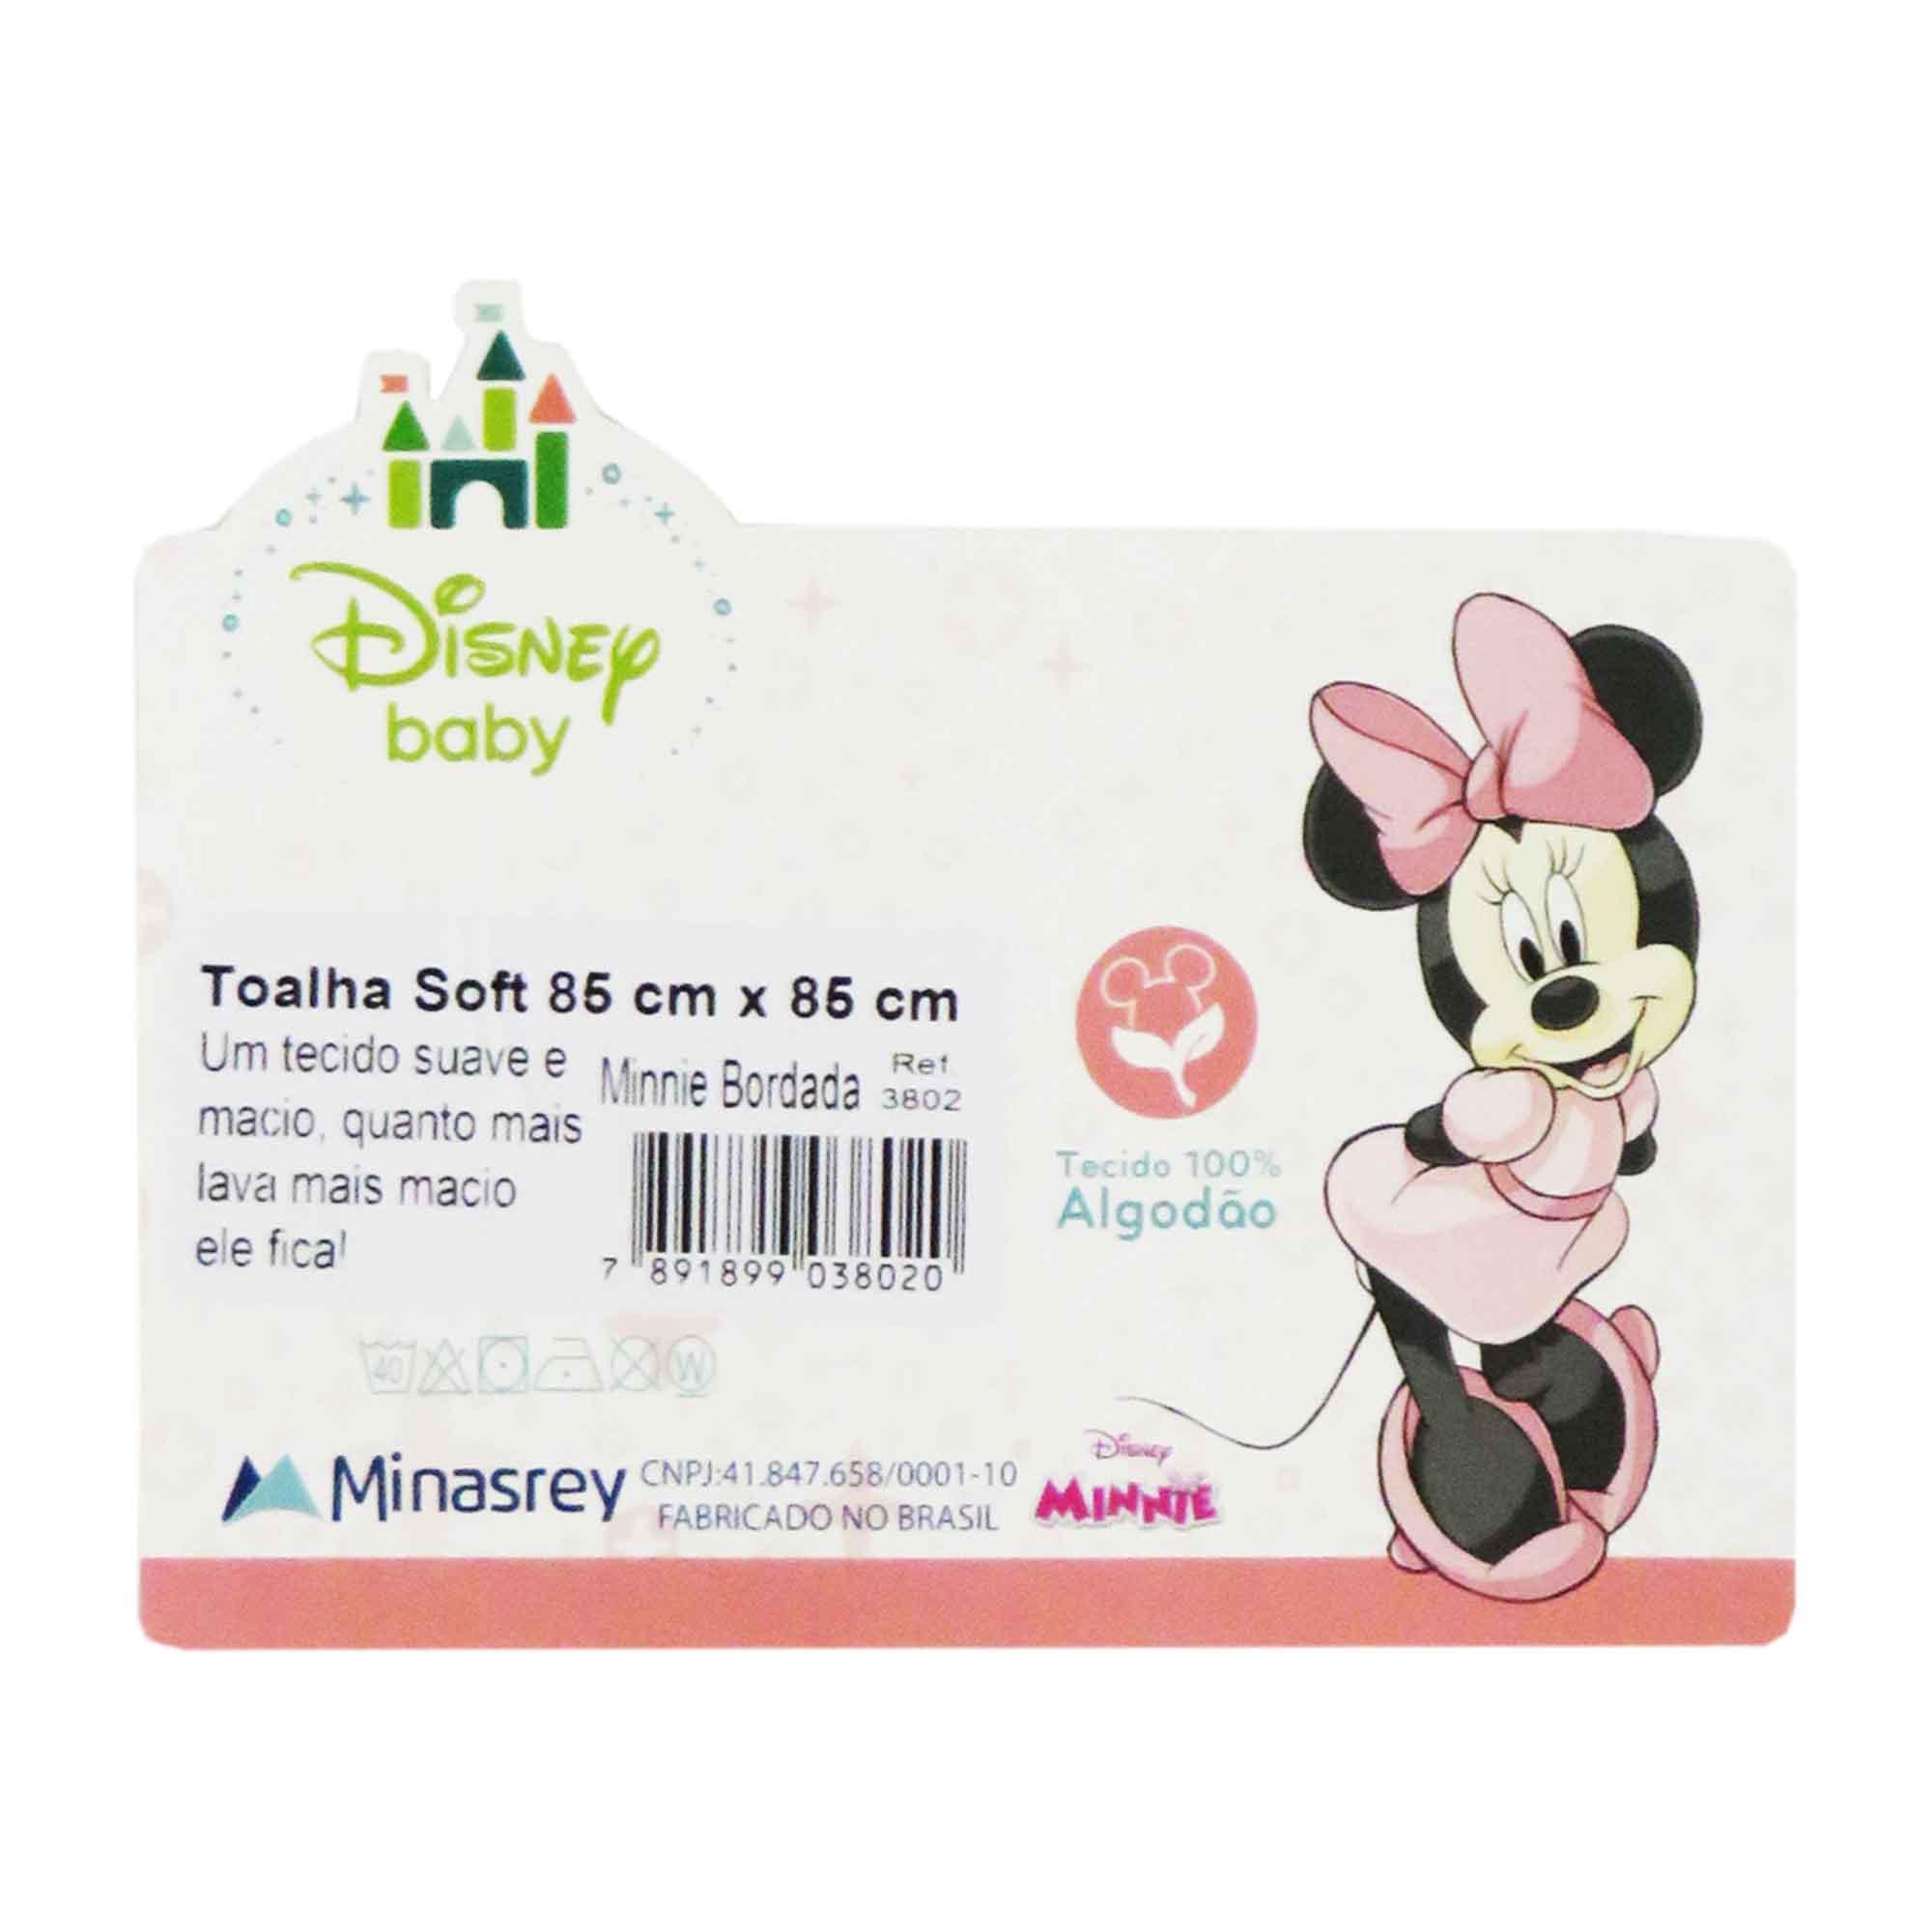 Toalha Soft Minasrey Disney Bordada Com Capuz - Minnie